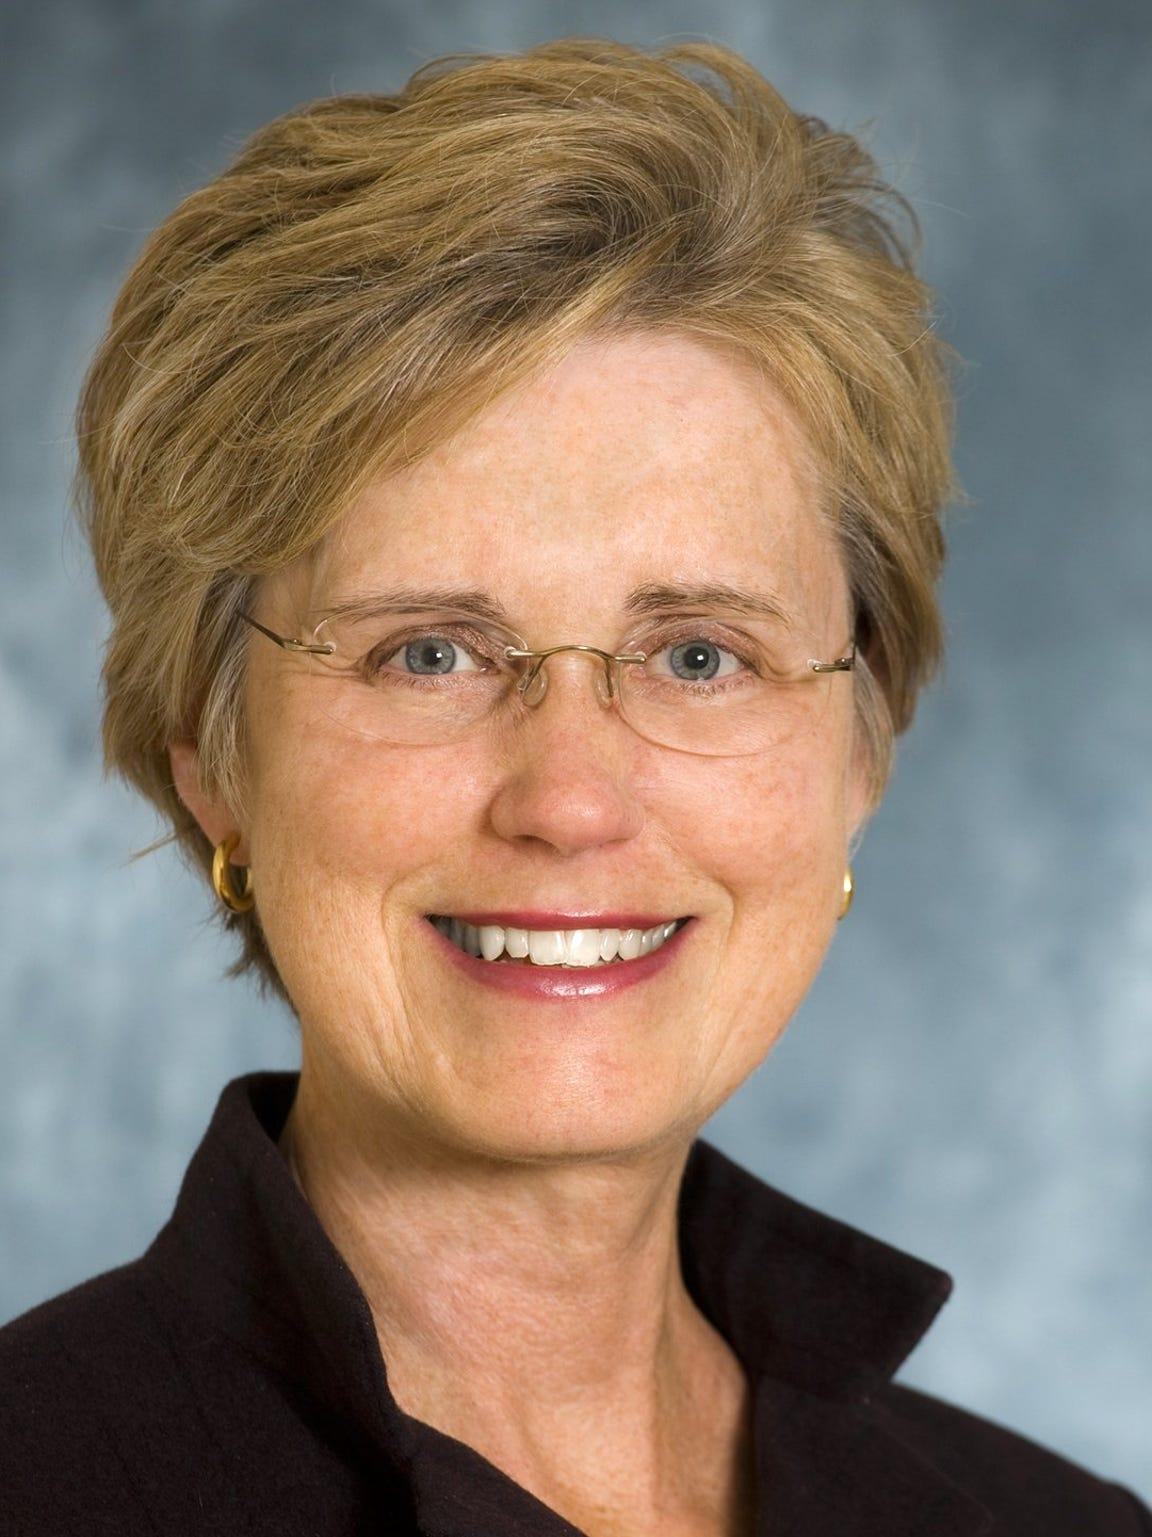 Mariam C. Noland, president of the Community Foundation